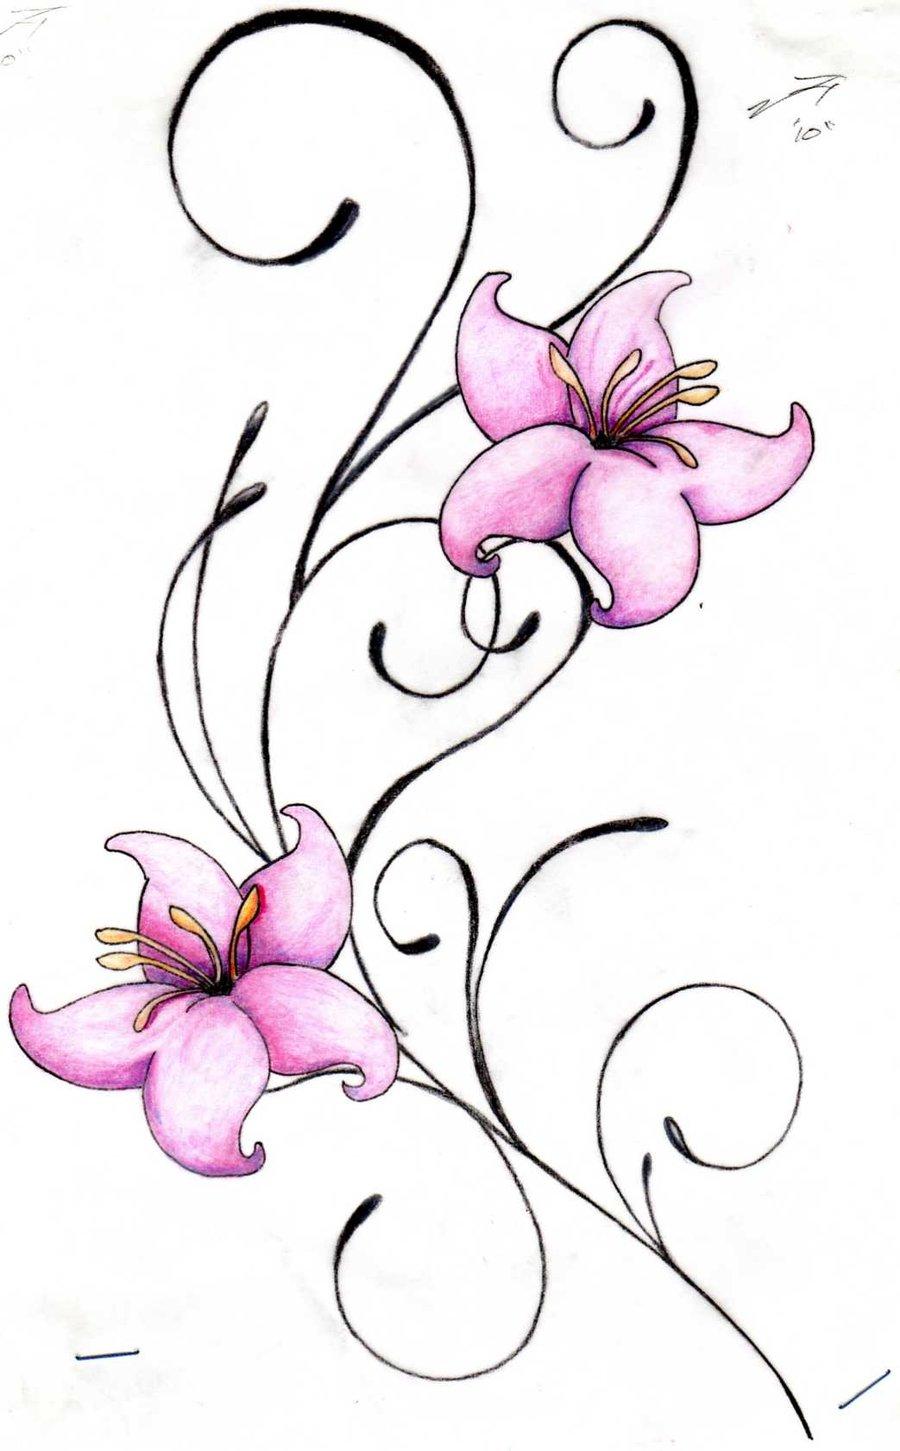 Pink Lily Flower Tattoo Design Sample